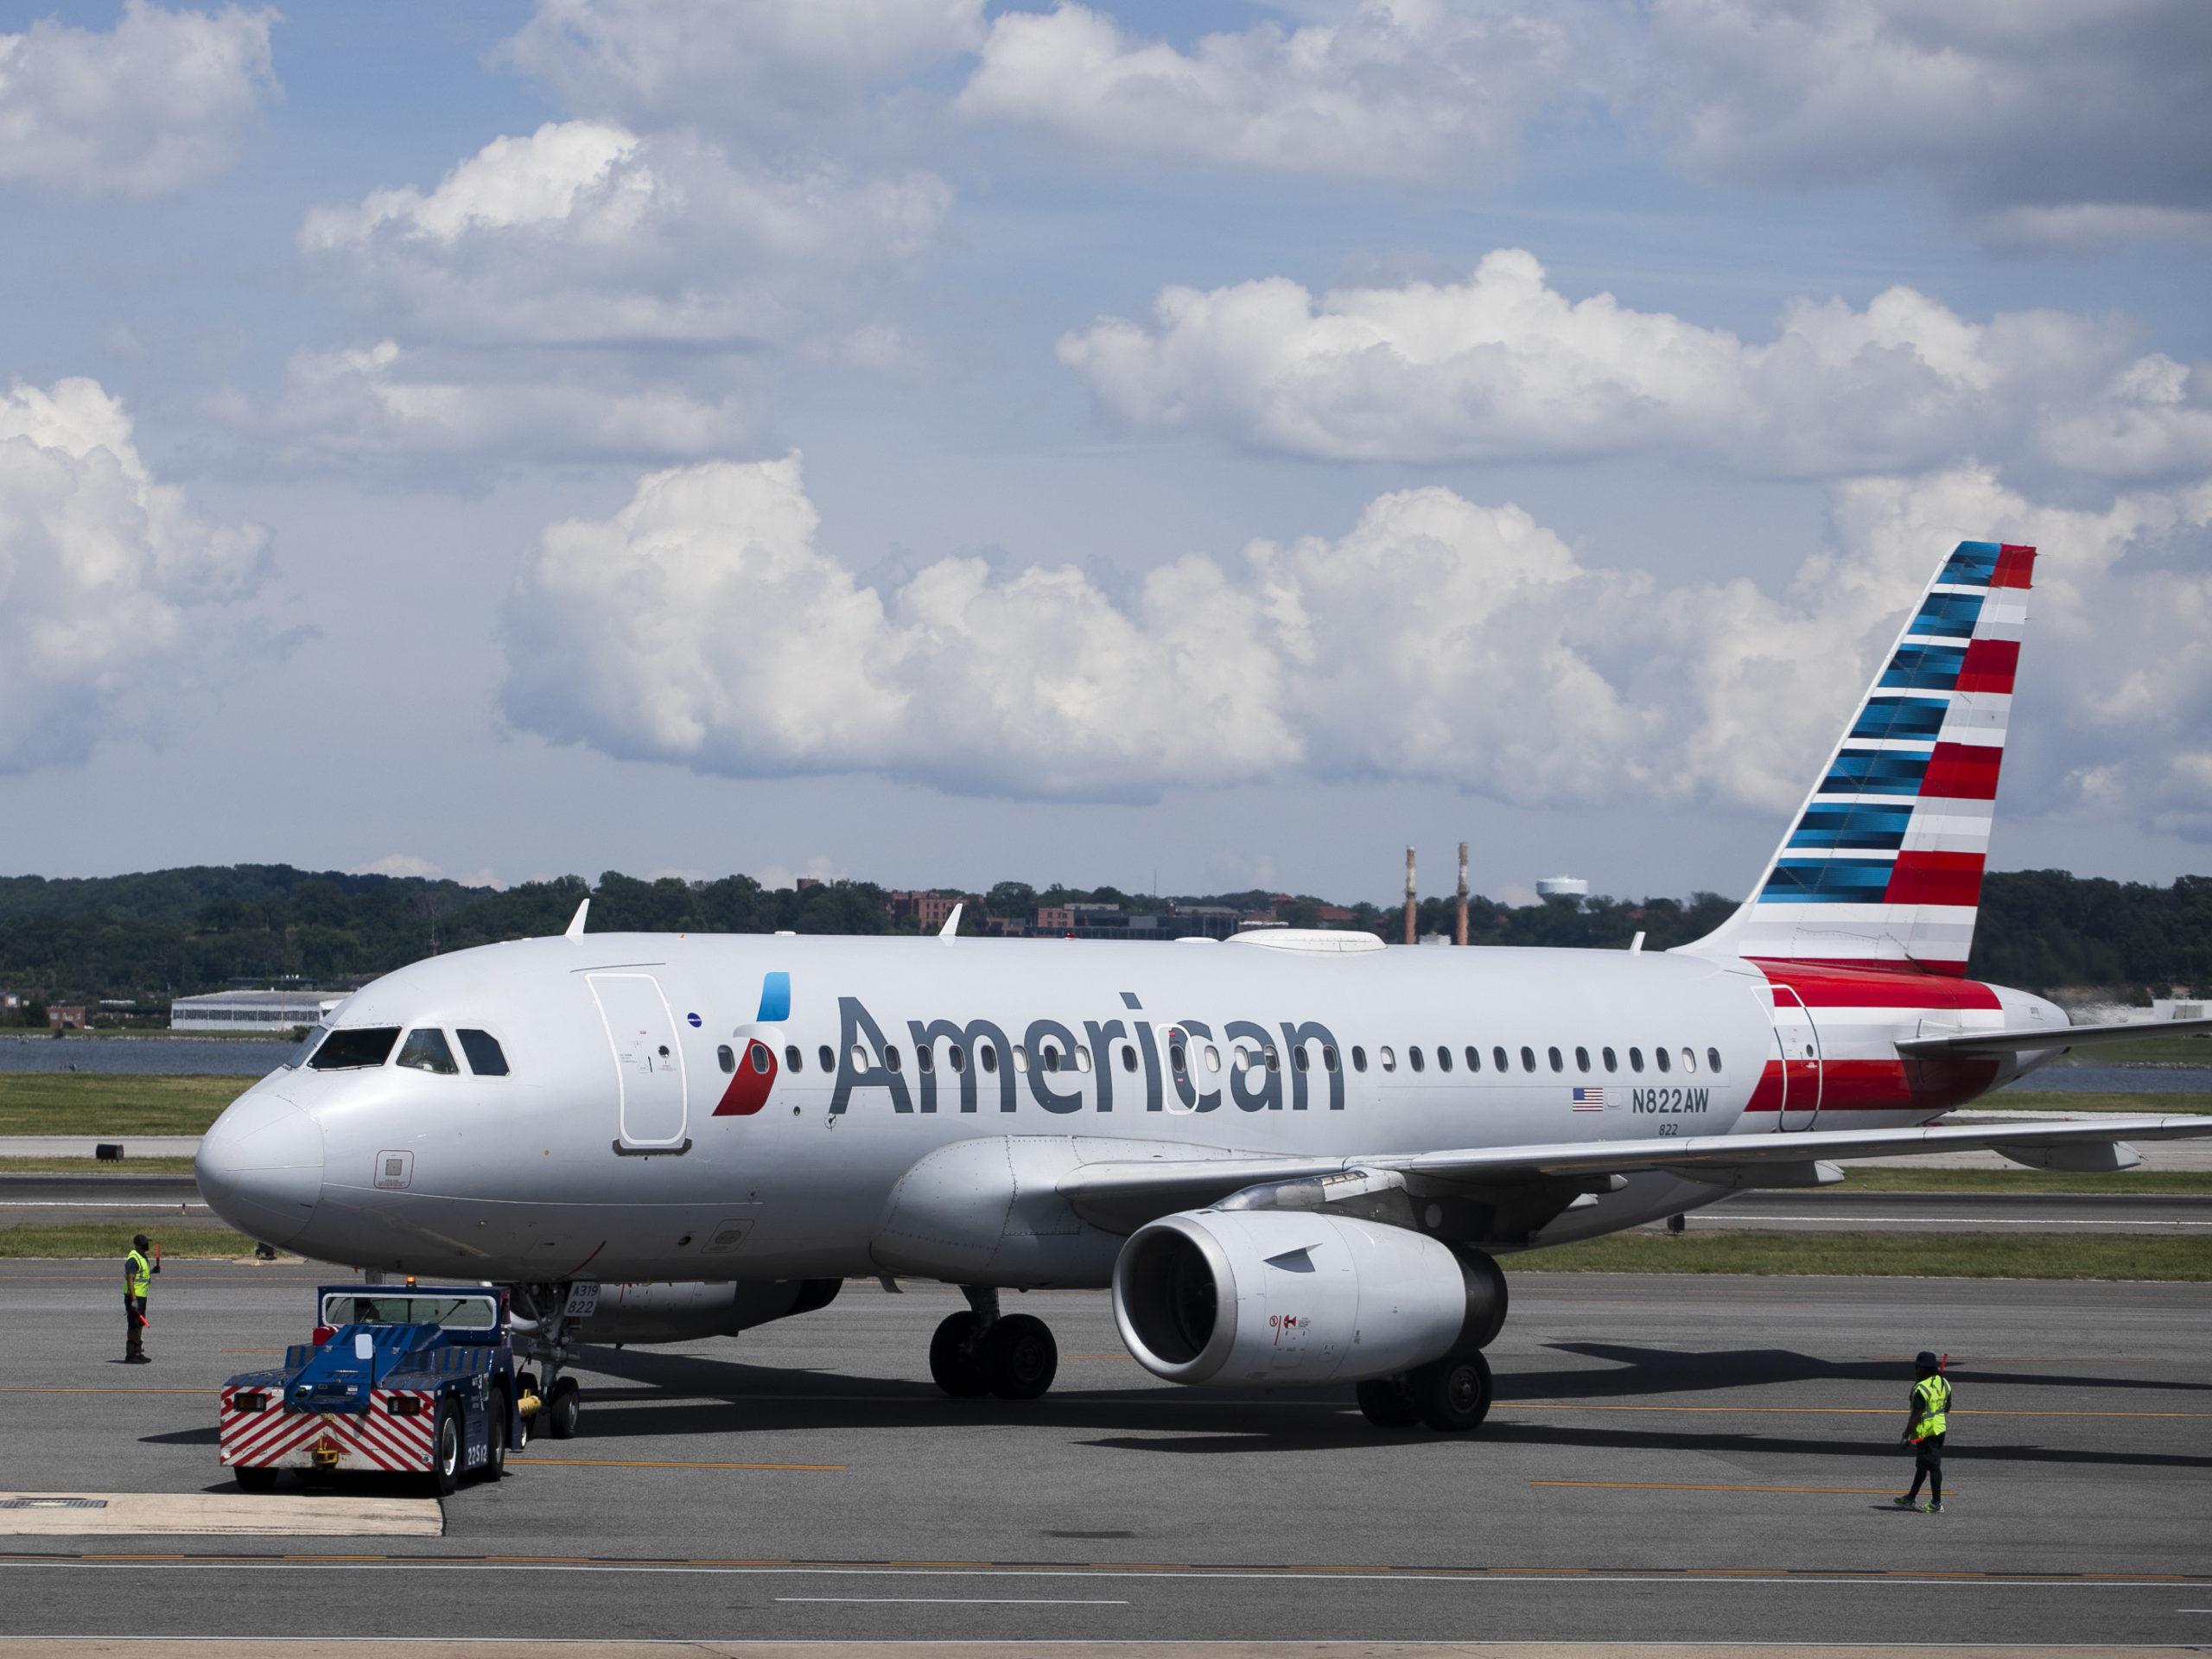 American Airlines plane Passenger tries to deboard mid flight! Mental Health